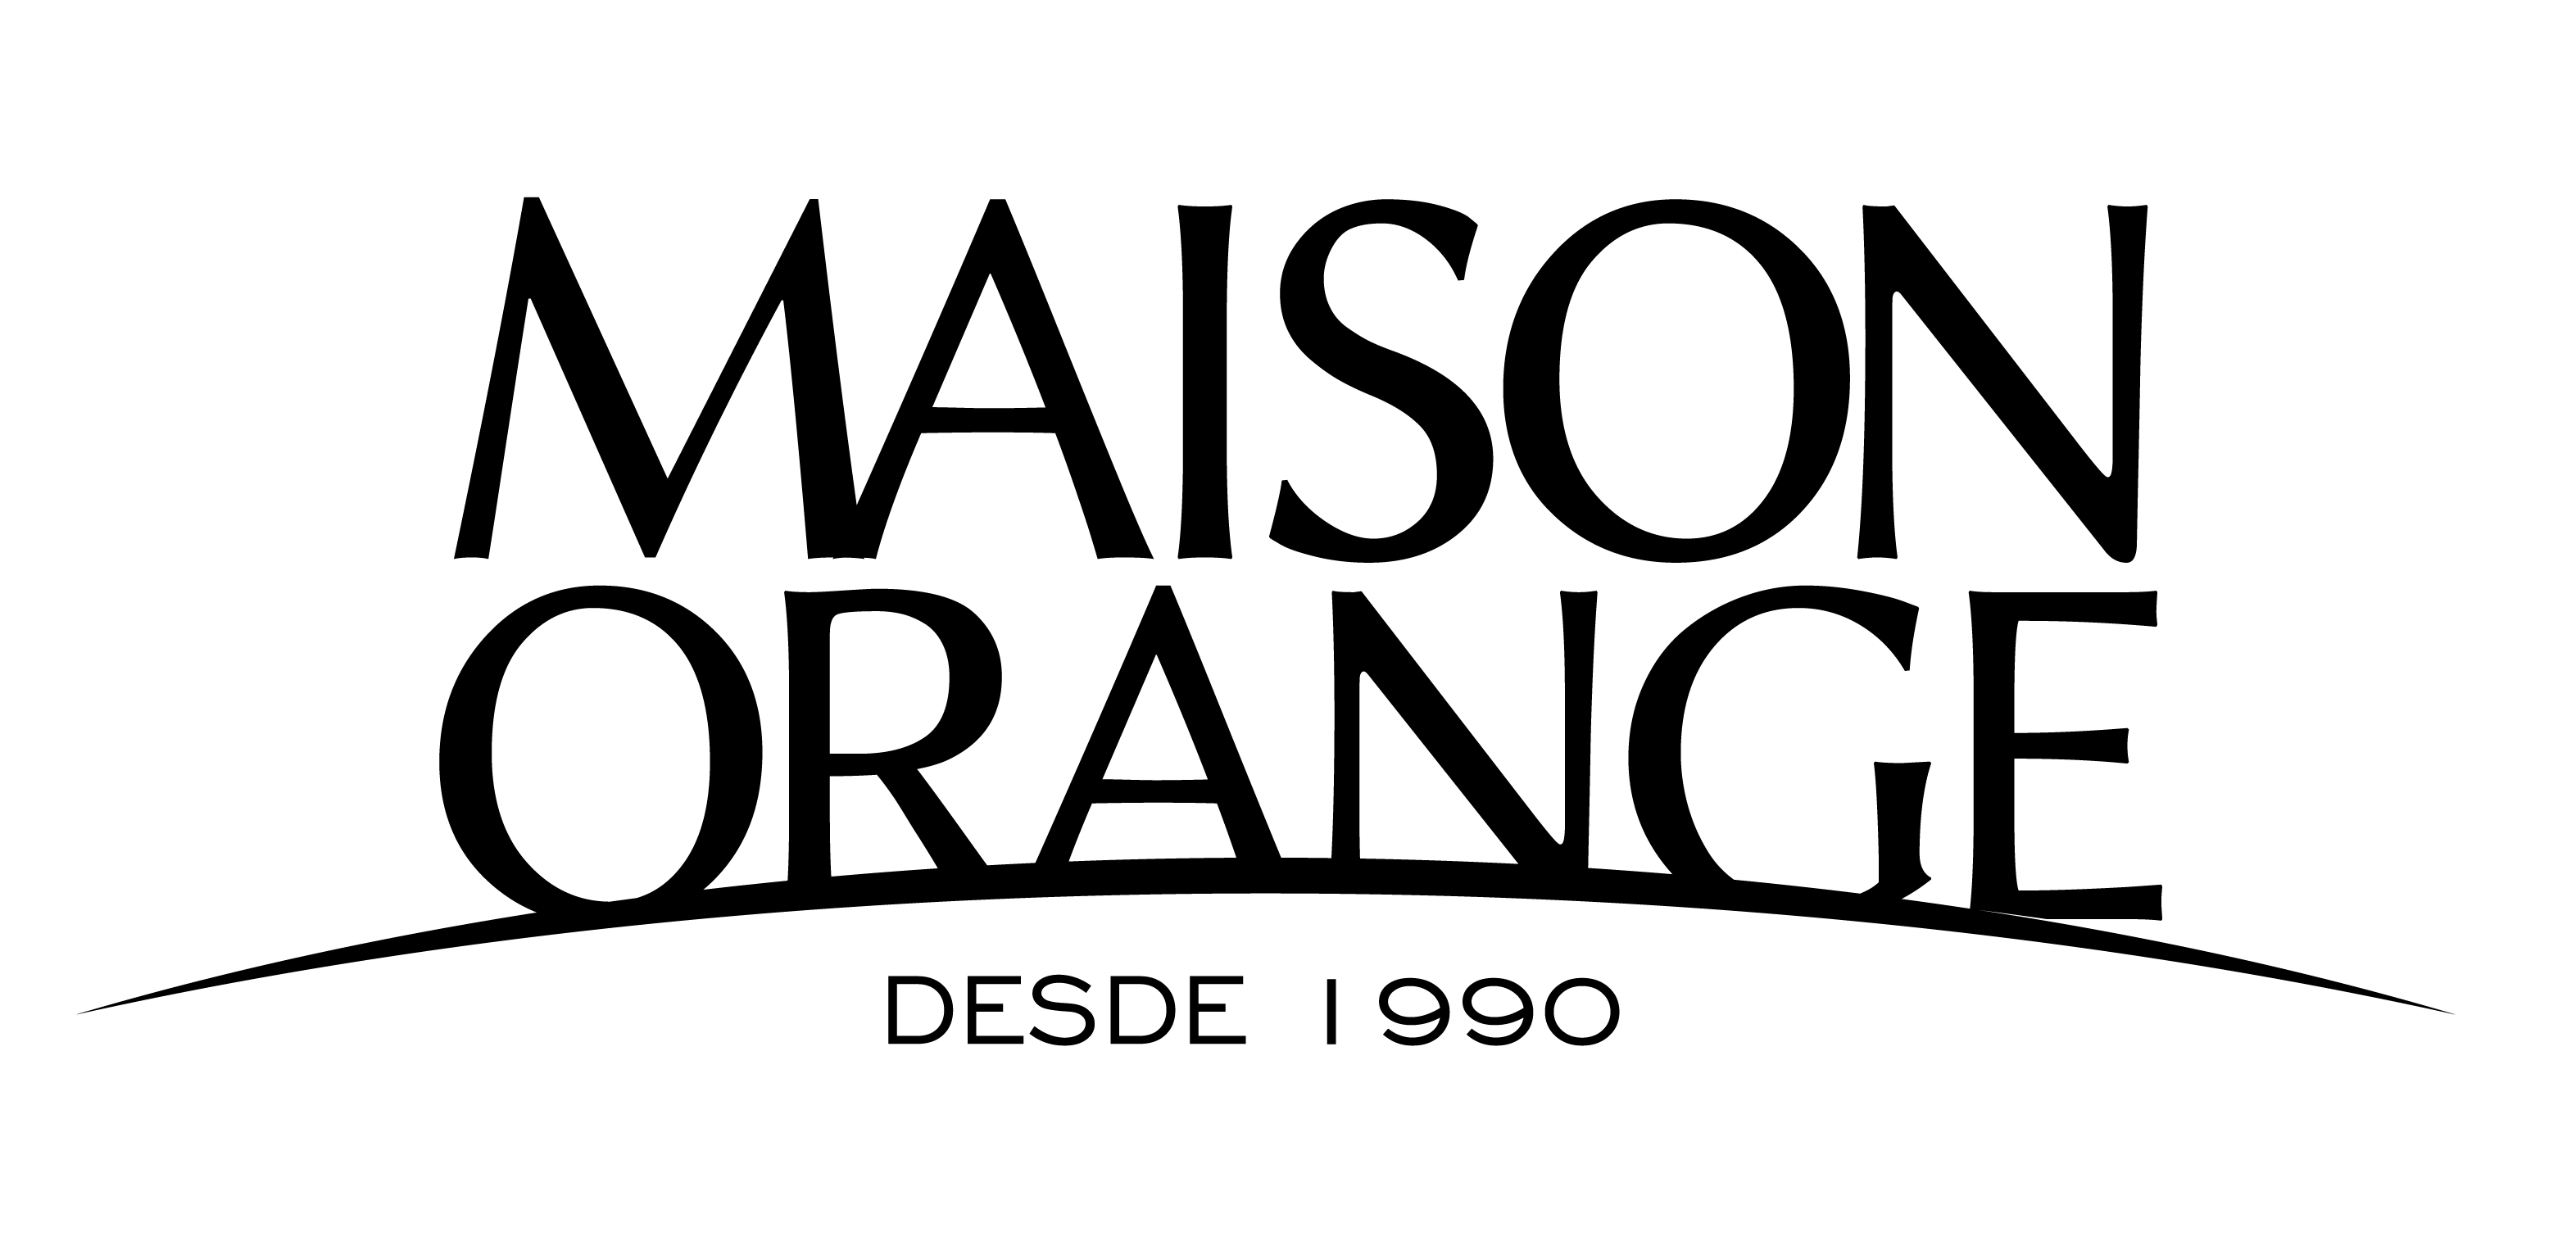 Maison Orange Cerimonial